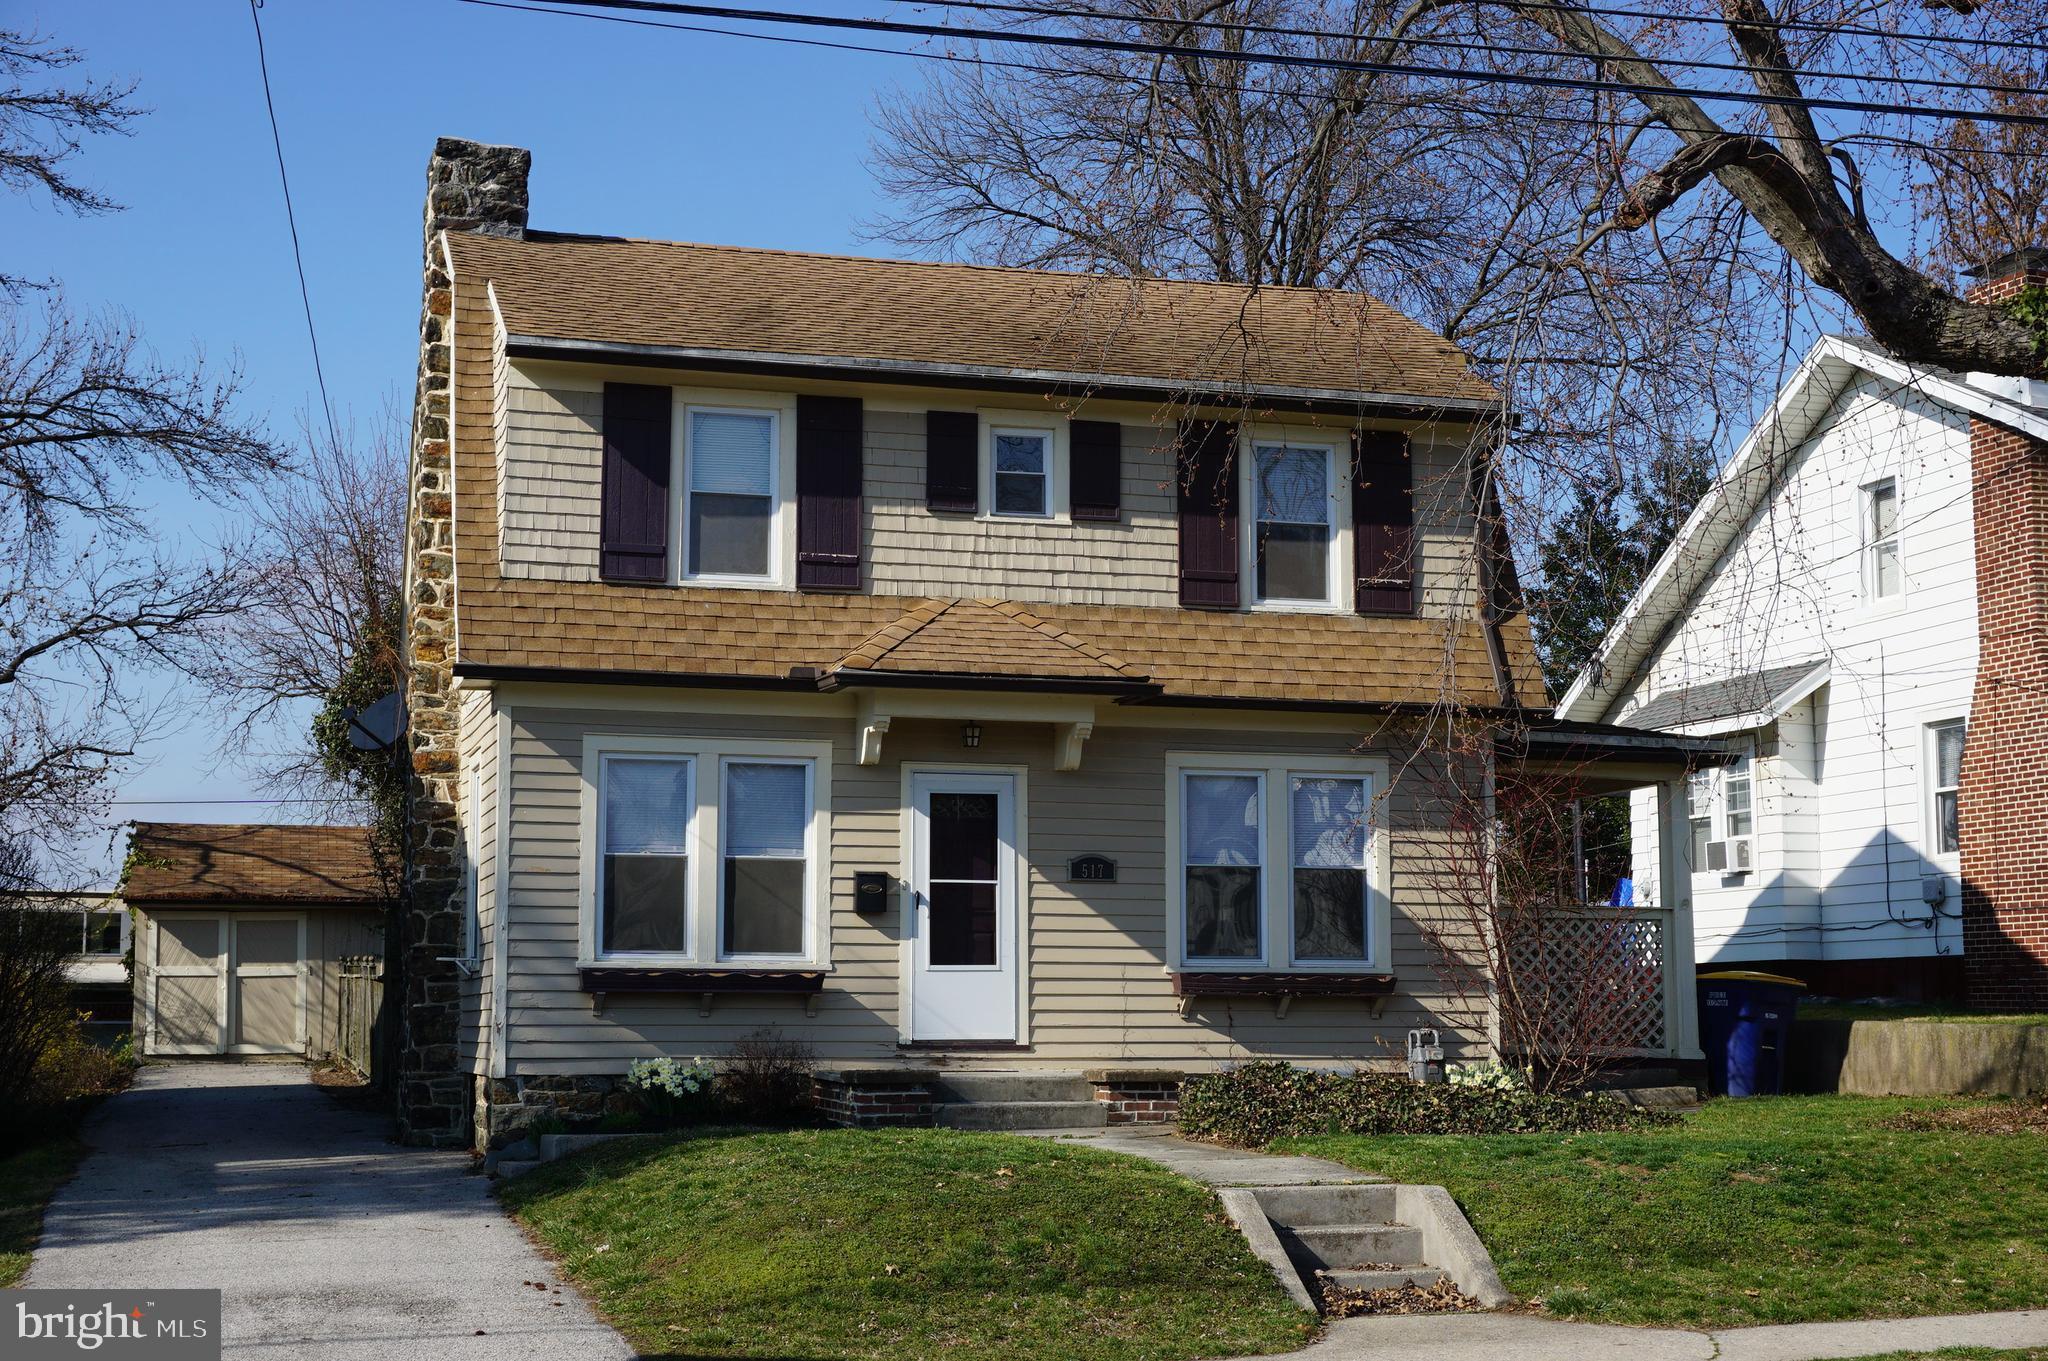 517 W Jackson Street, York, PA 17401